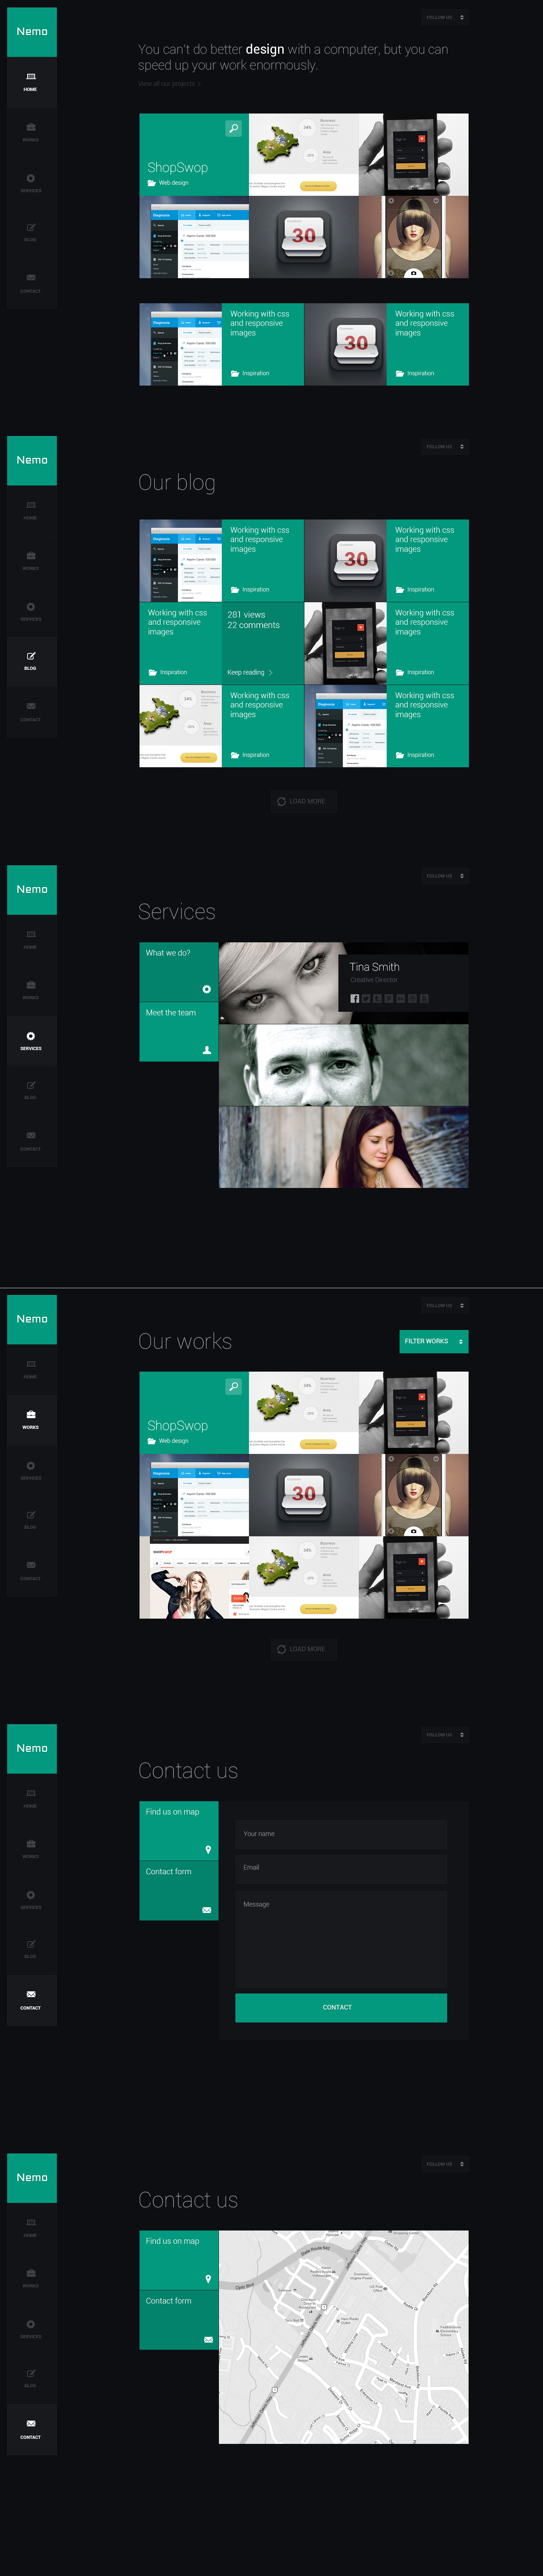 Grow Your World With Nemo Desktop Webdesign In 2020 Website Design Inspiration Layout Fun Website Design Web Design